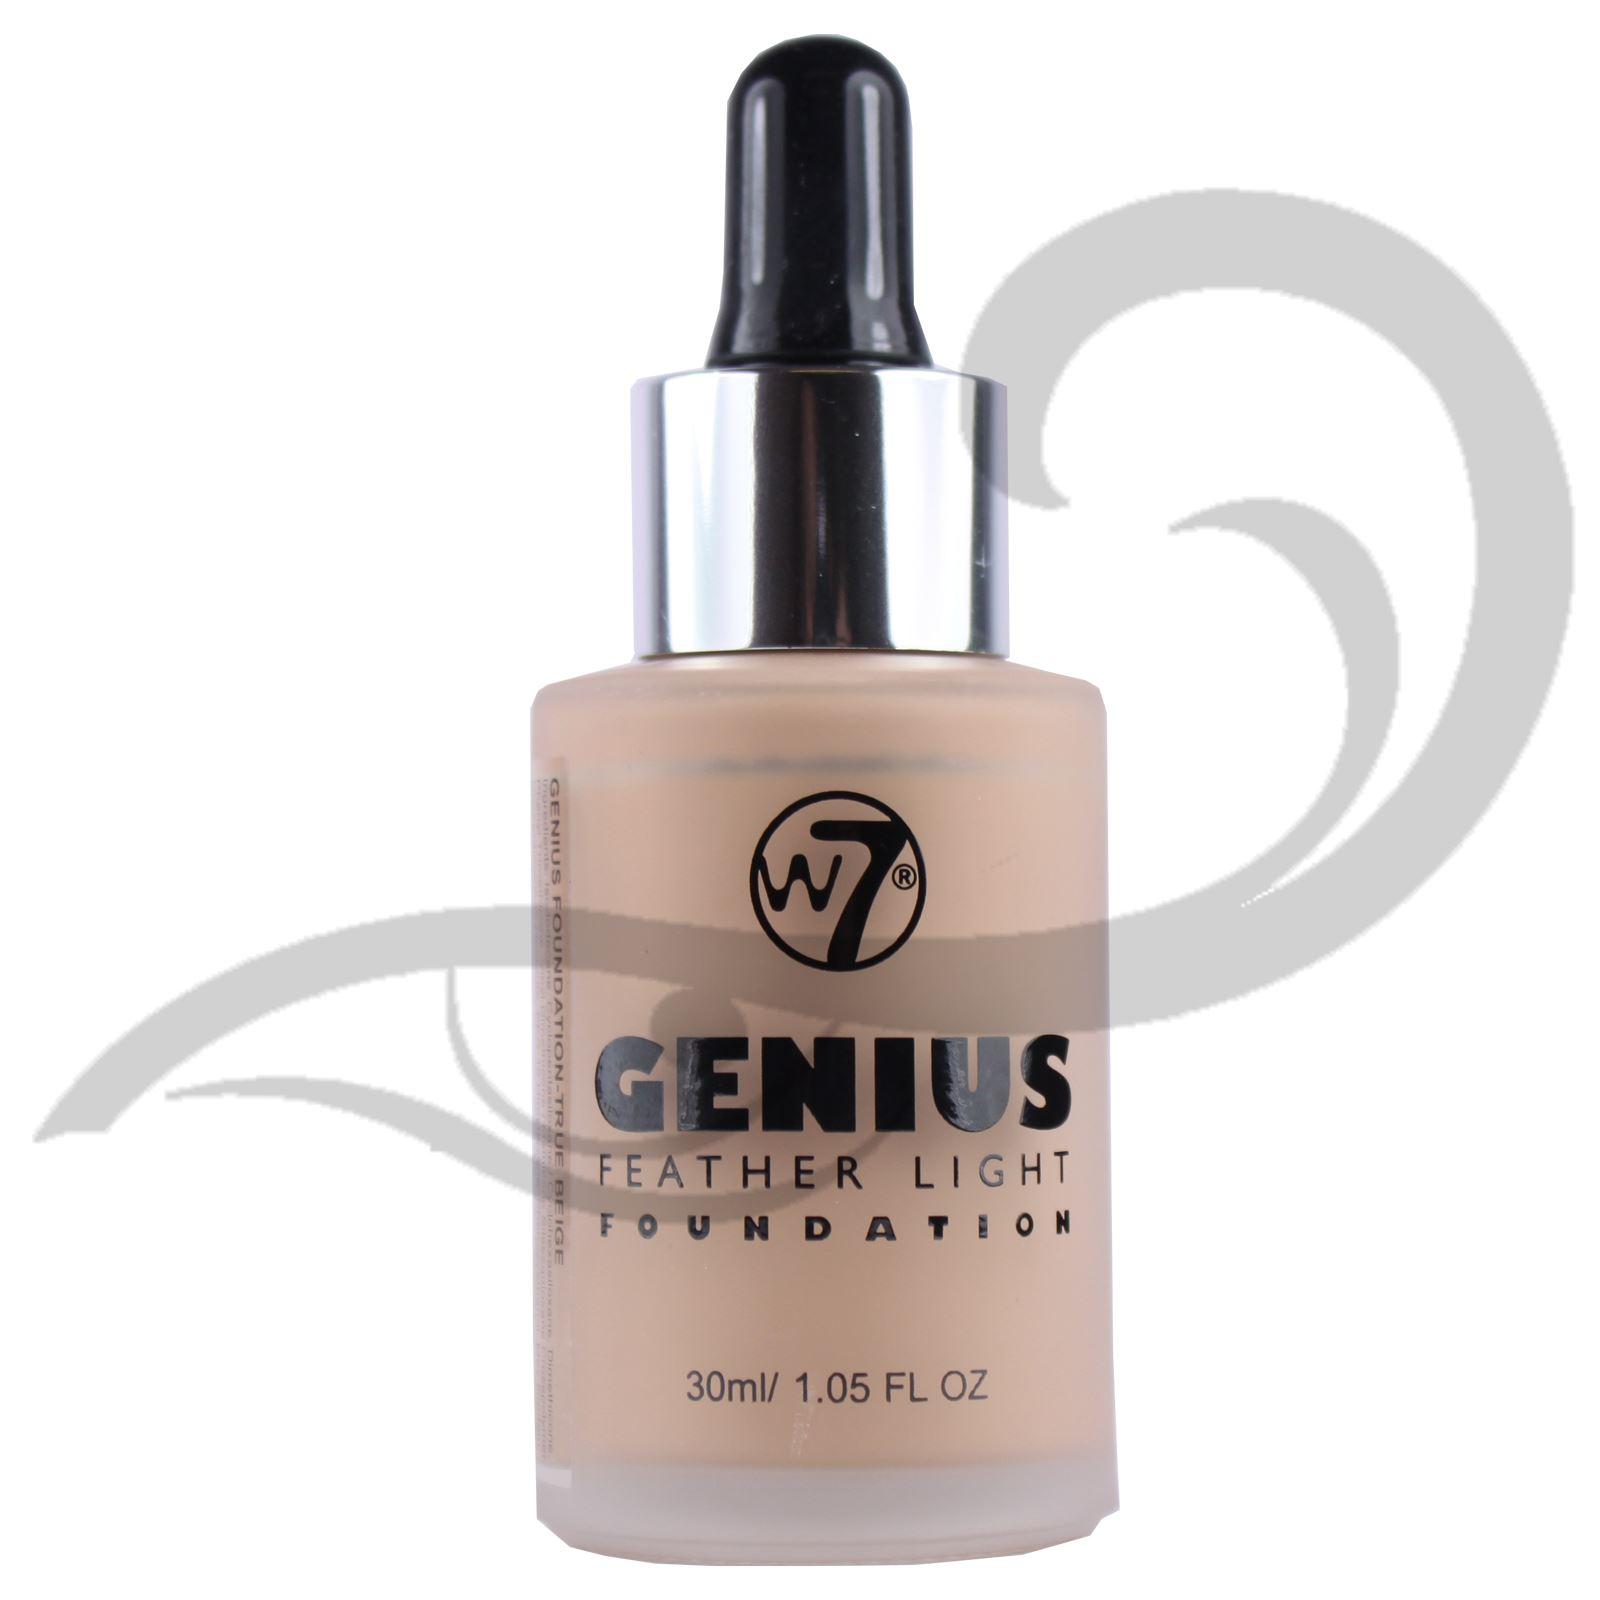 base maquillaje w7